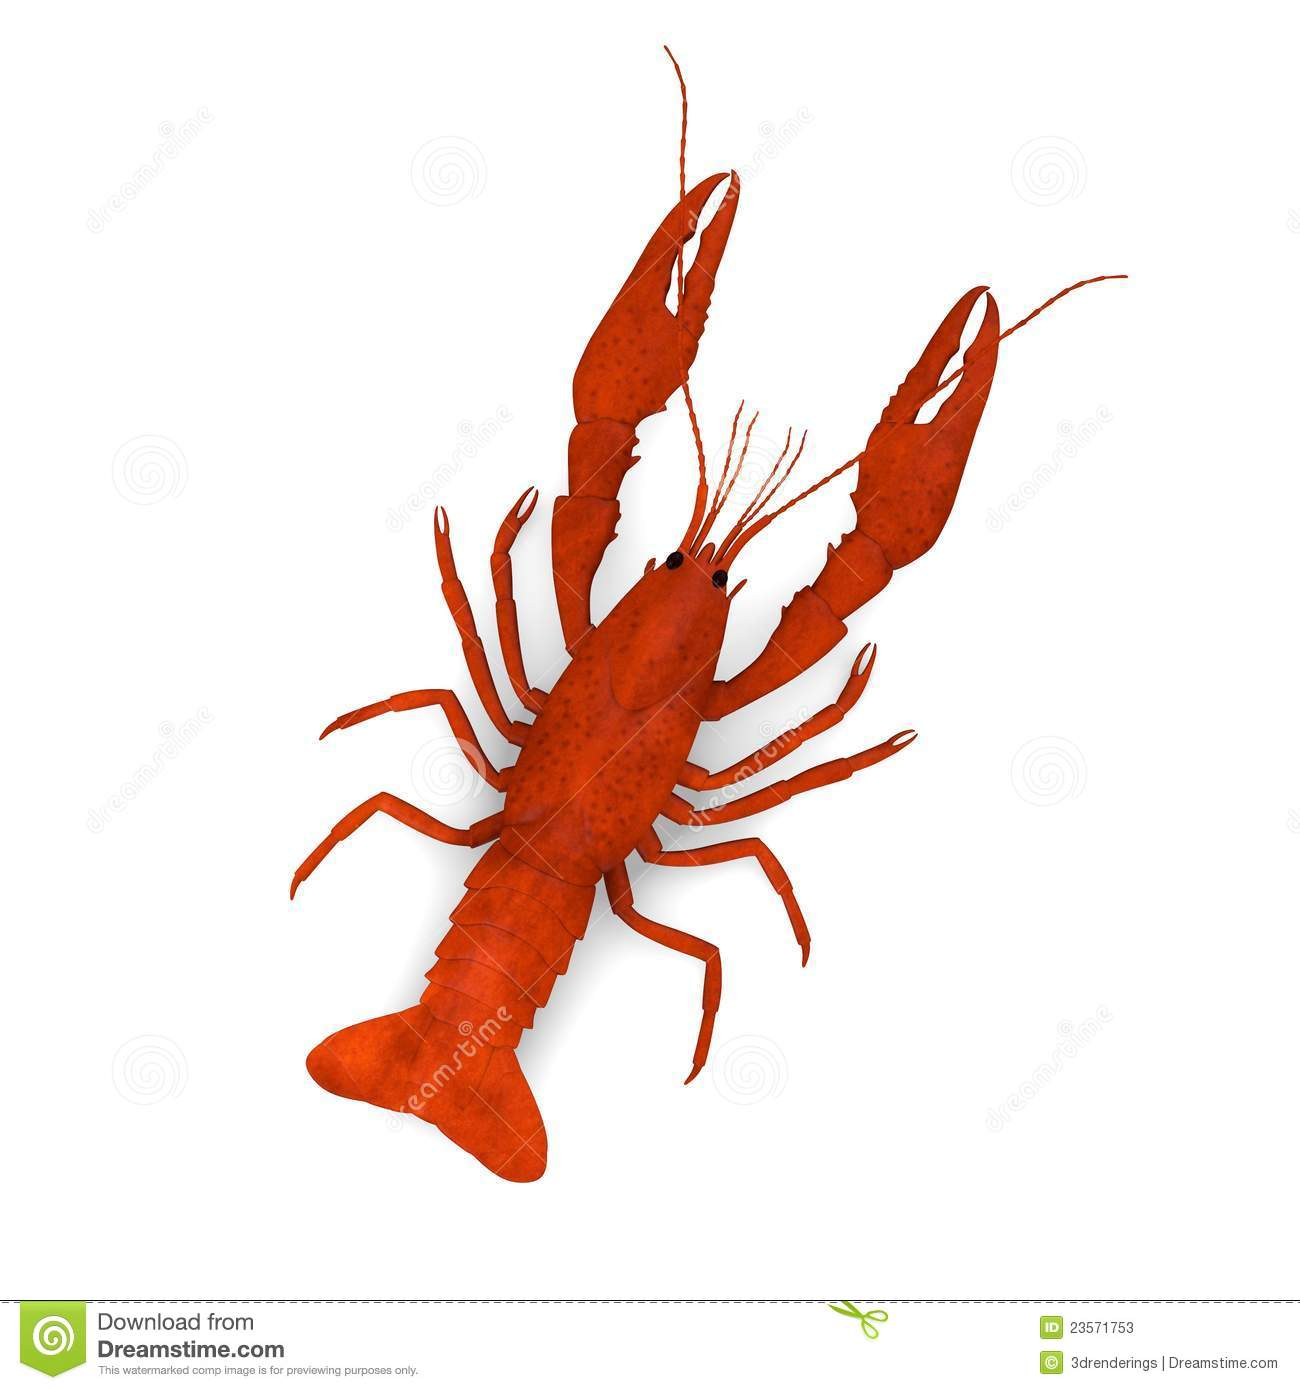 crayfish clipartlook. Crawfish clipart yabbie